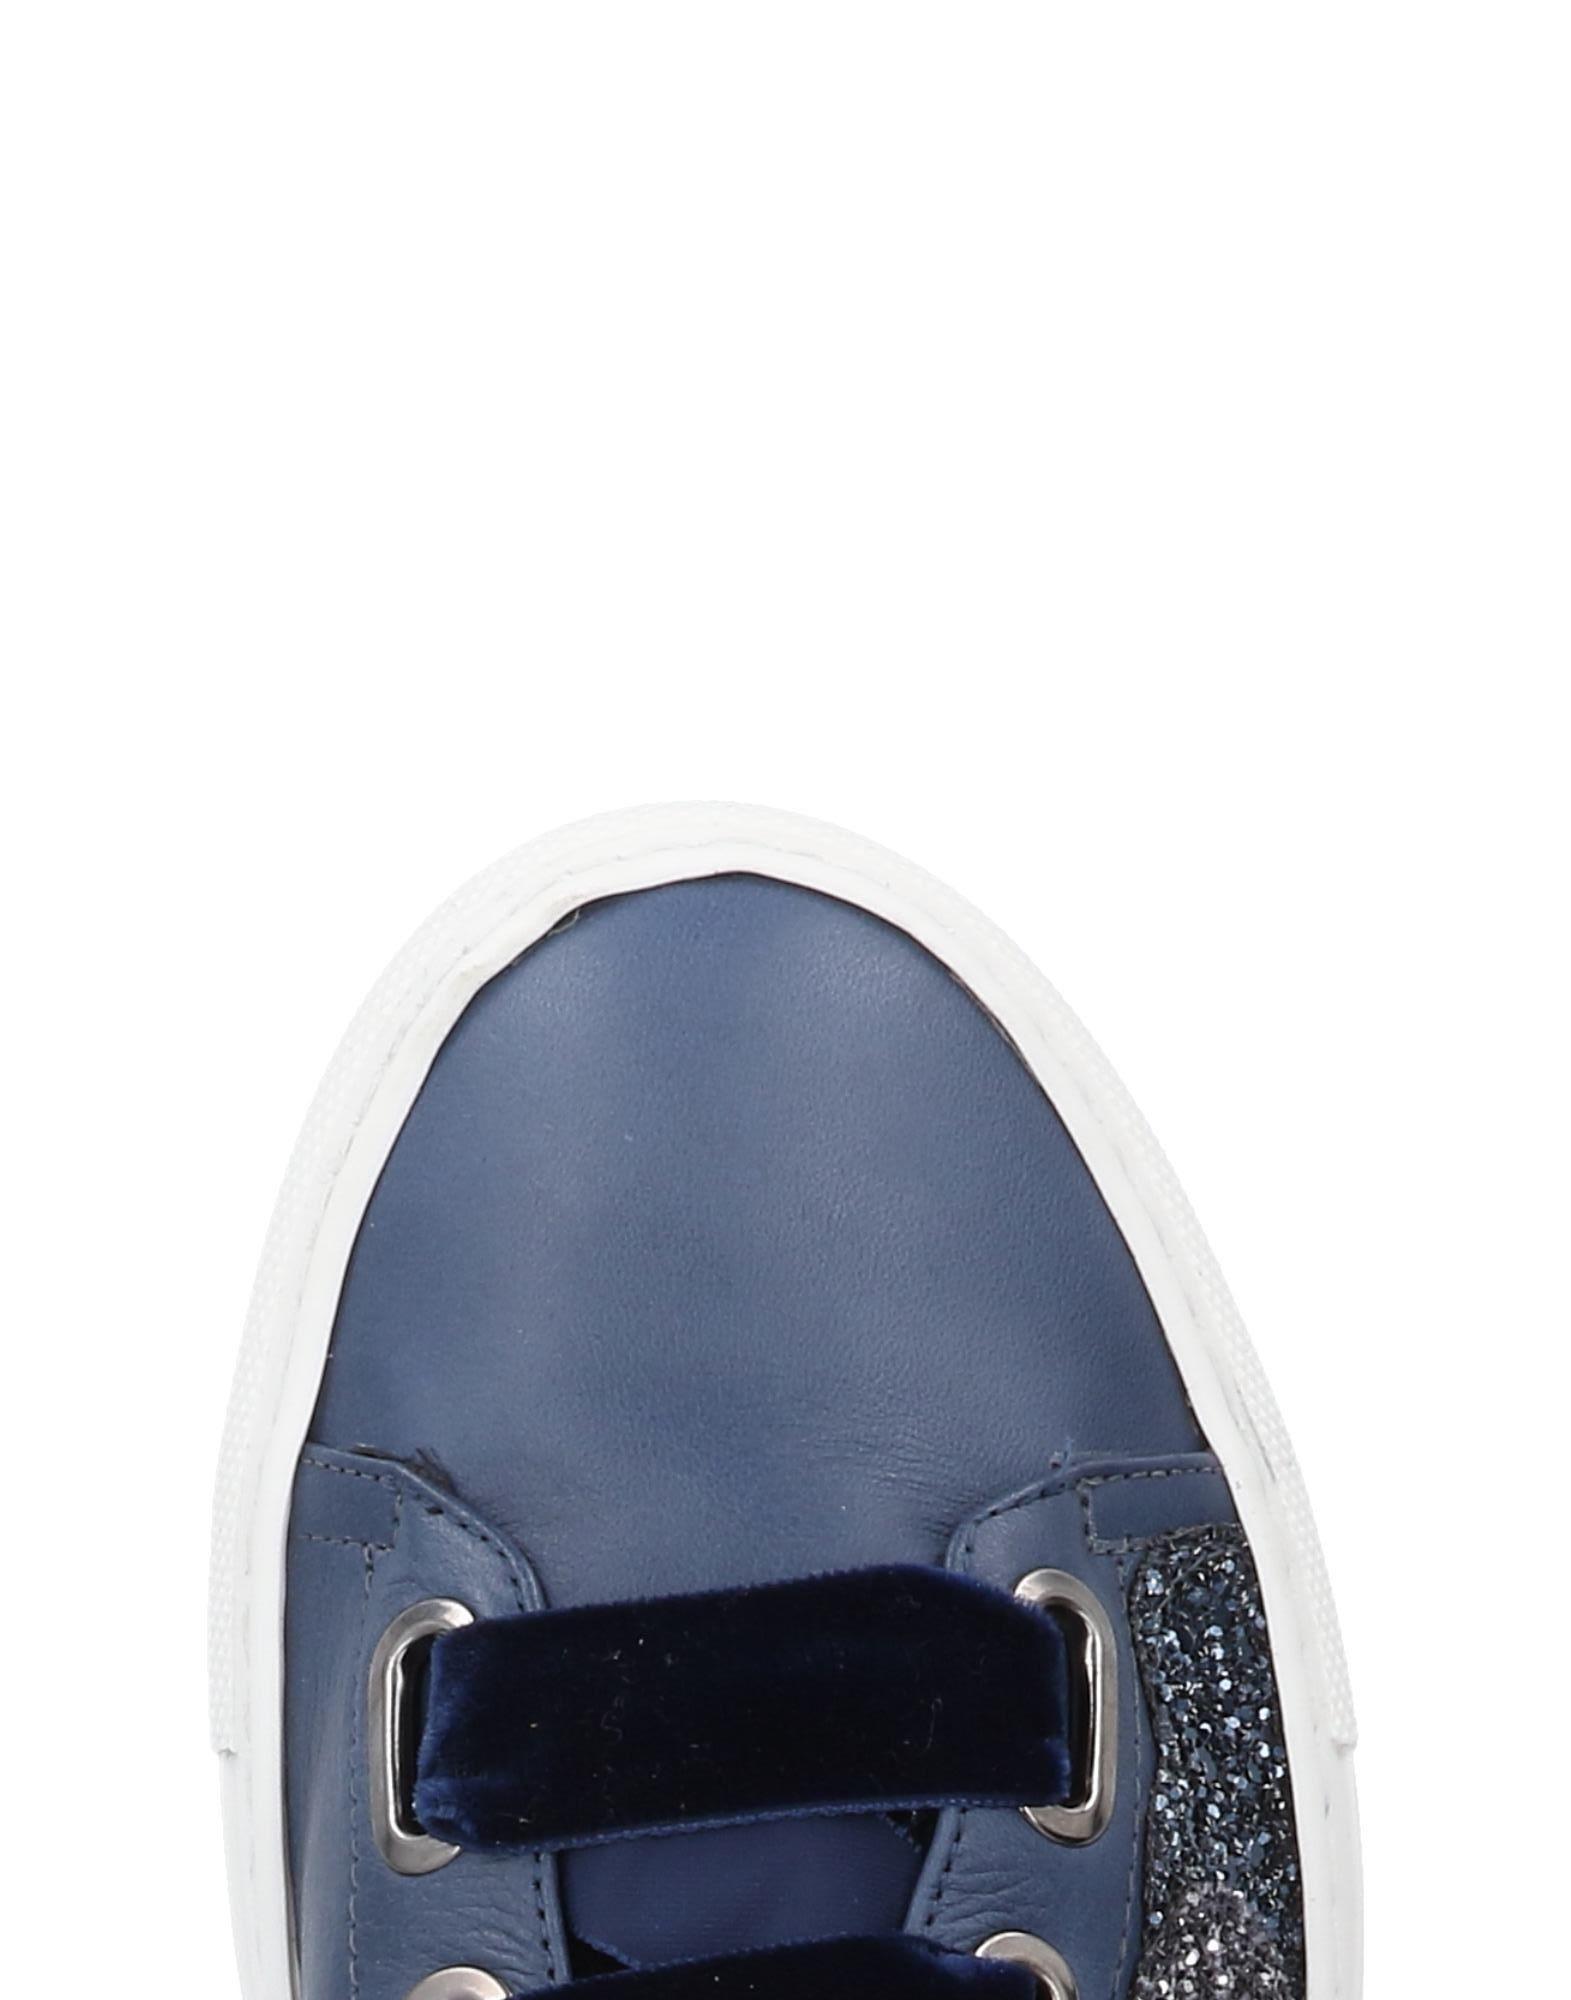 Stele Leather Low-tops & Sneakers in Dark Blue (Blue)